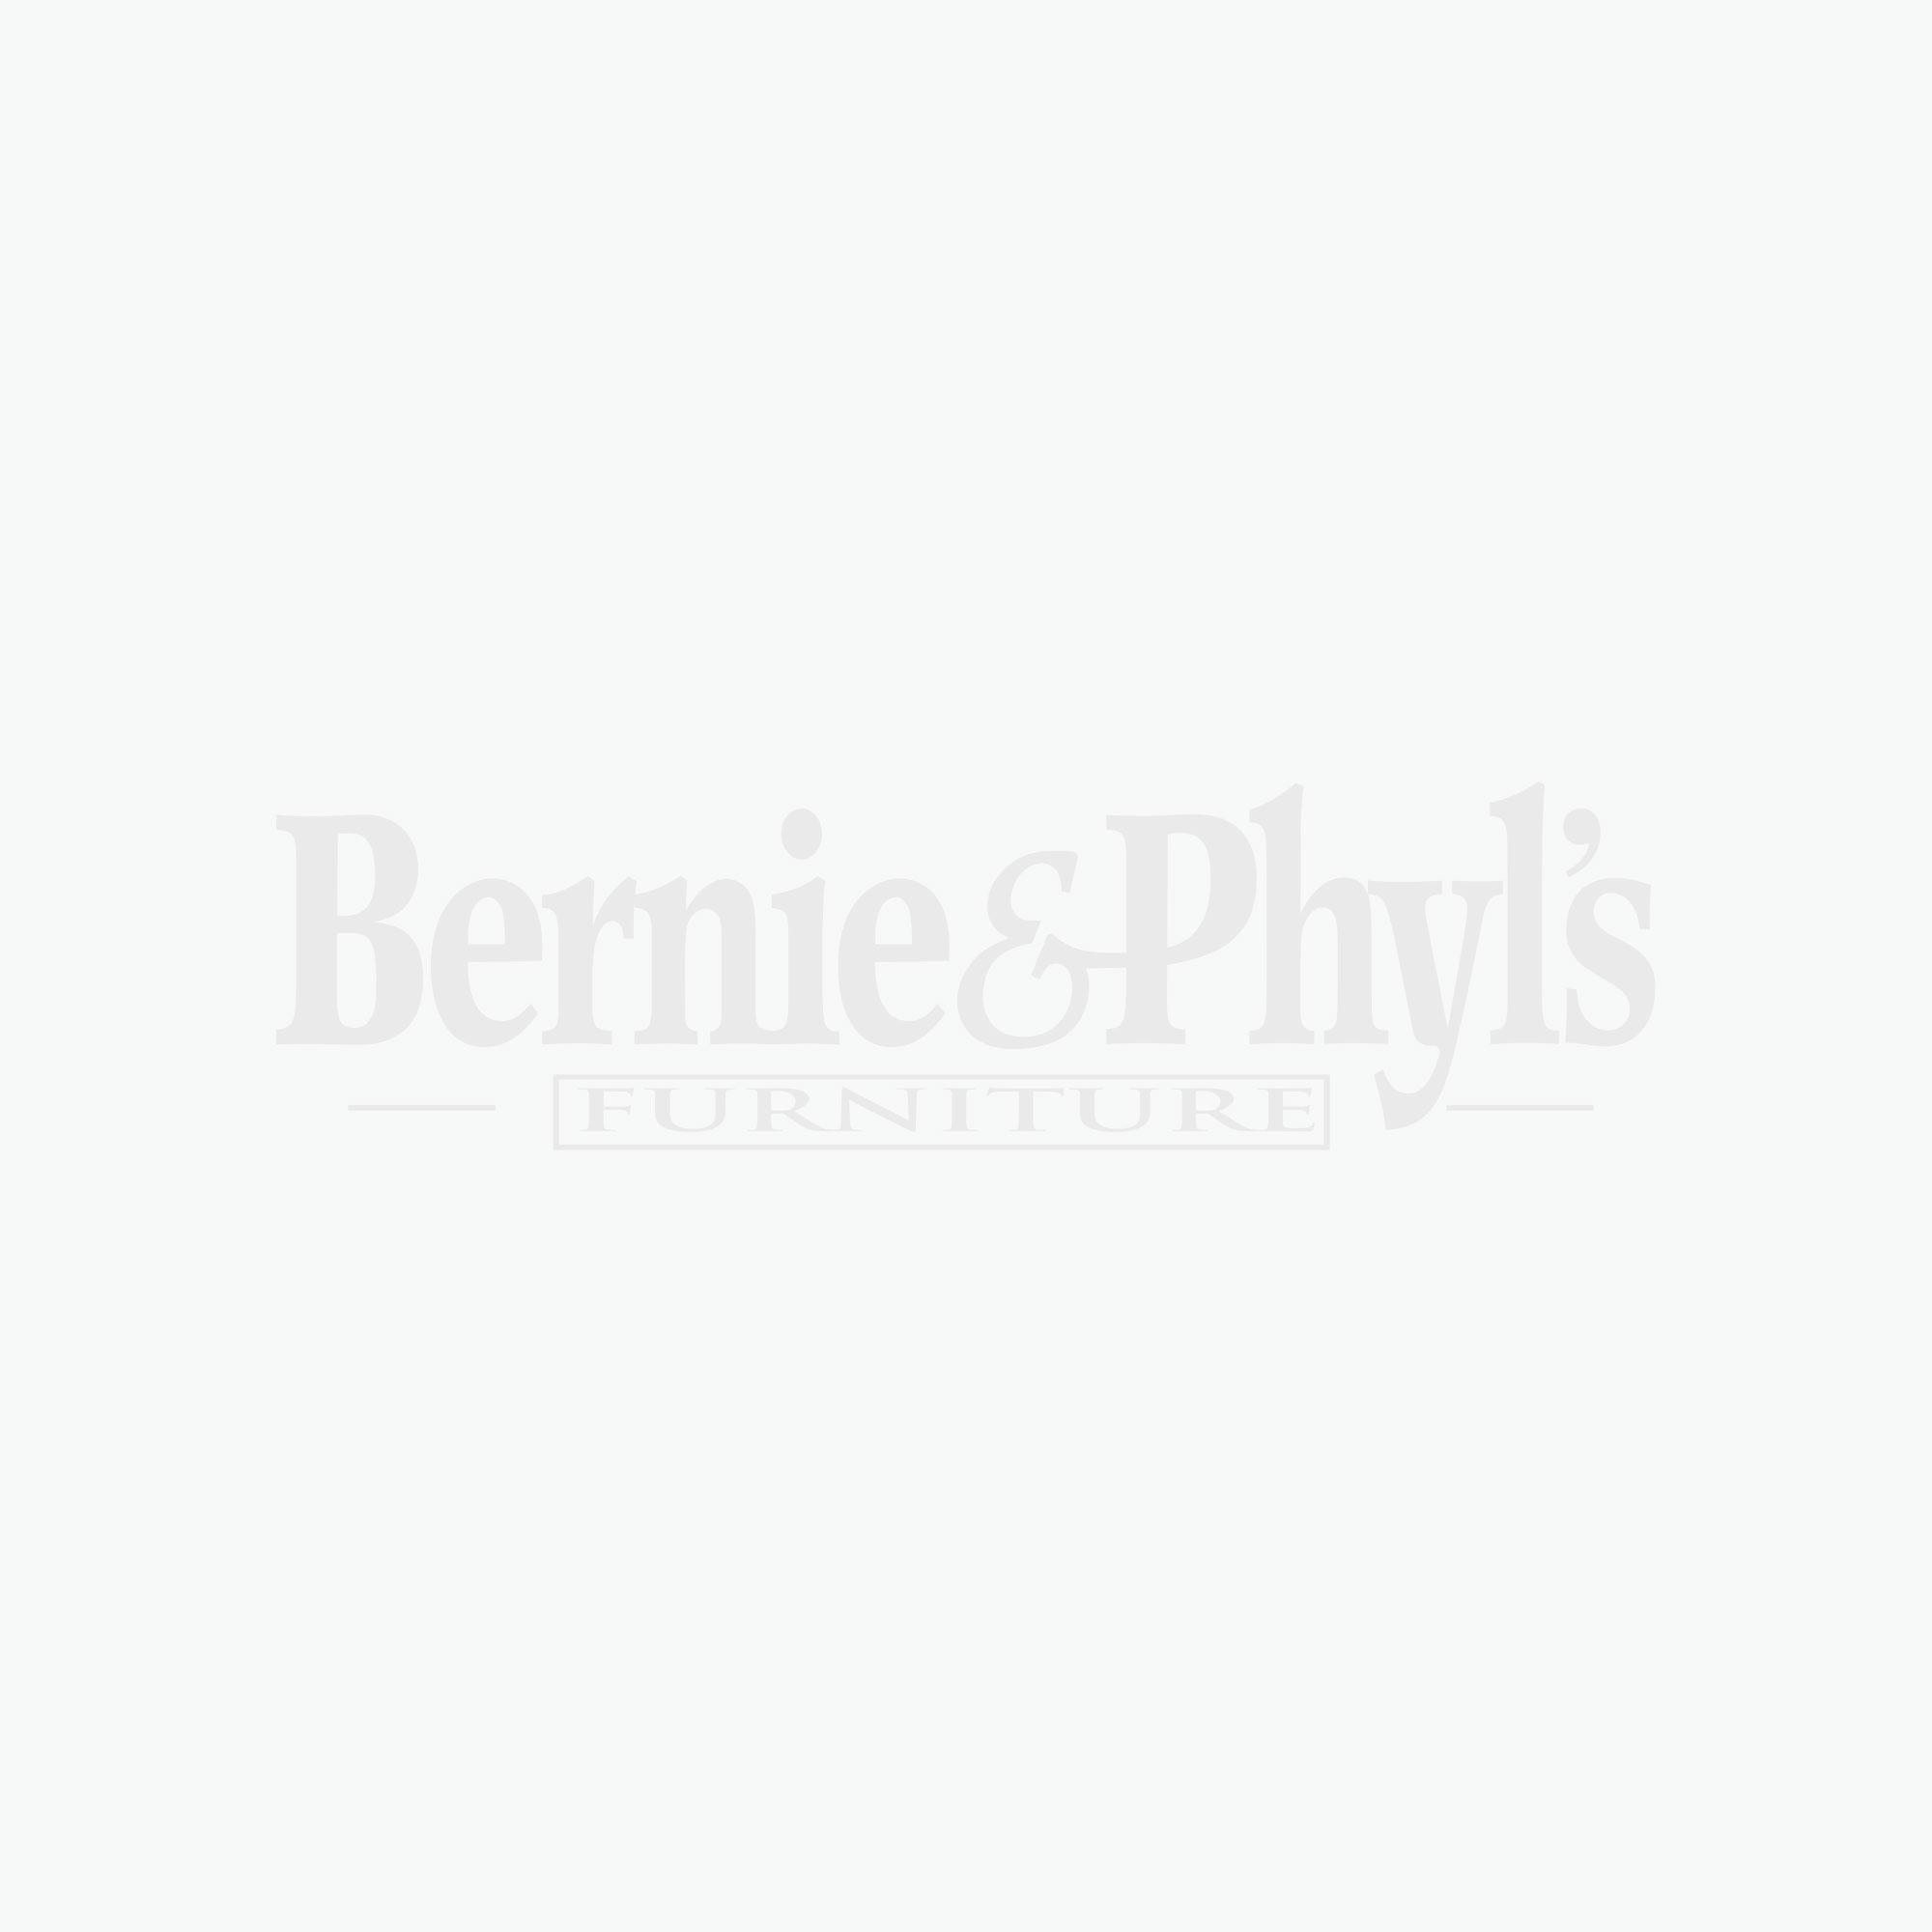 westlake storage bed - bernie & phyl's furniture -a-america